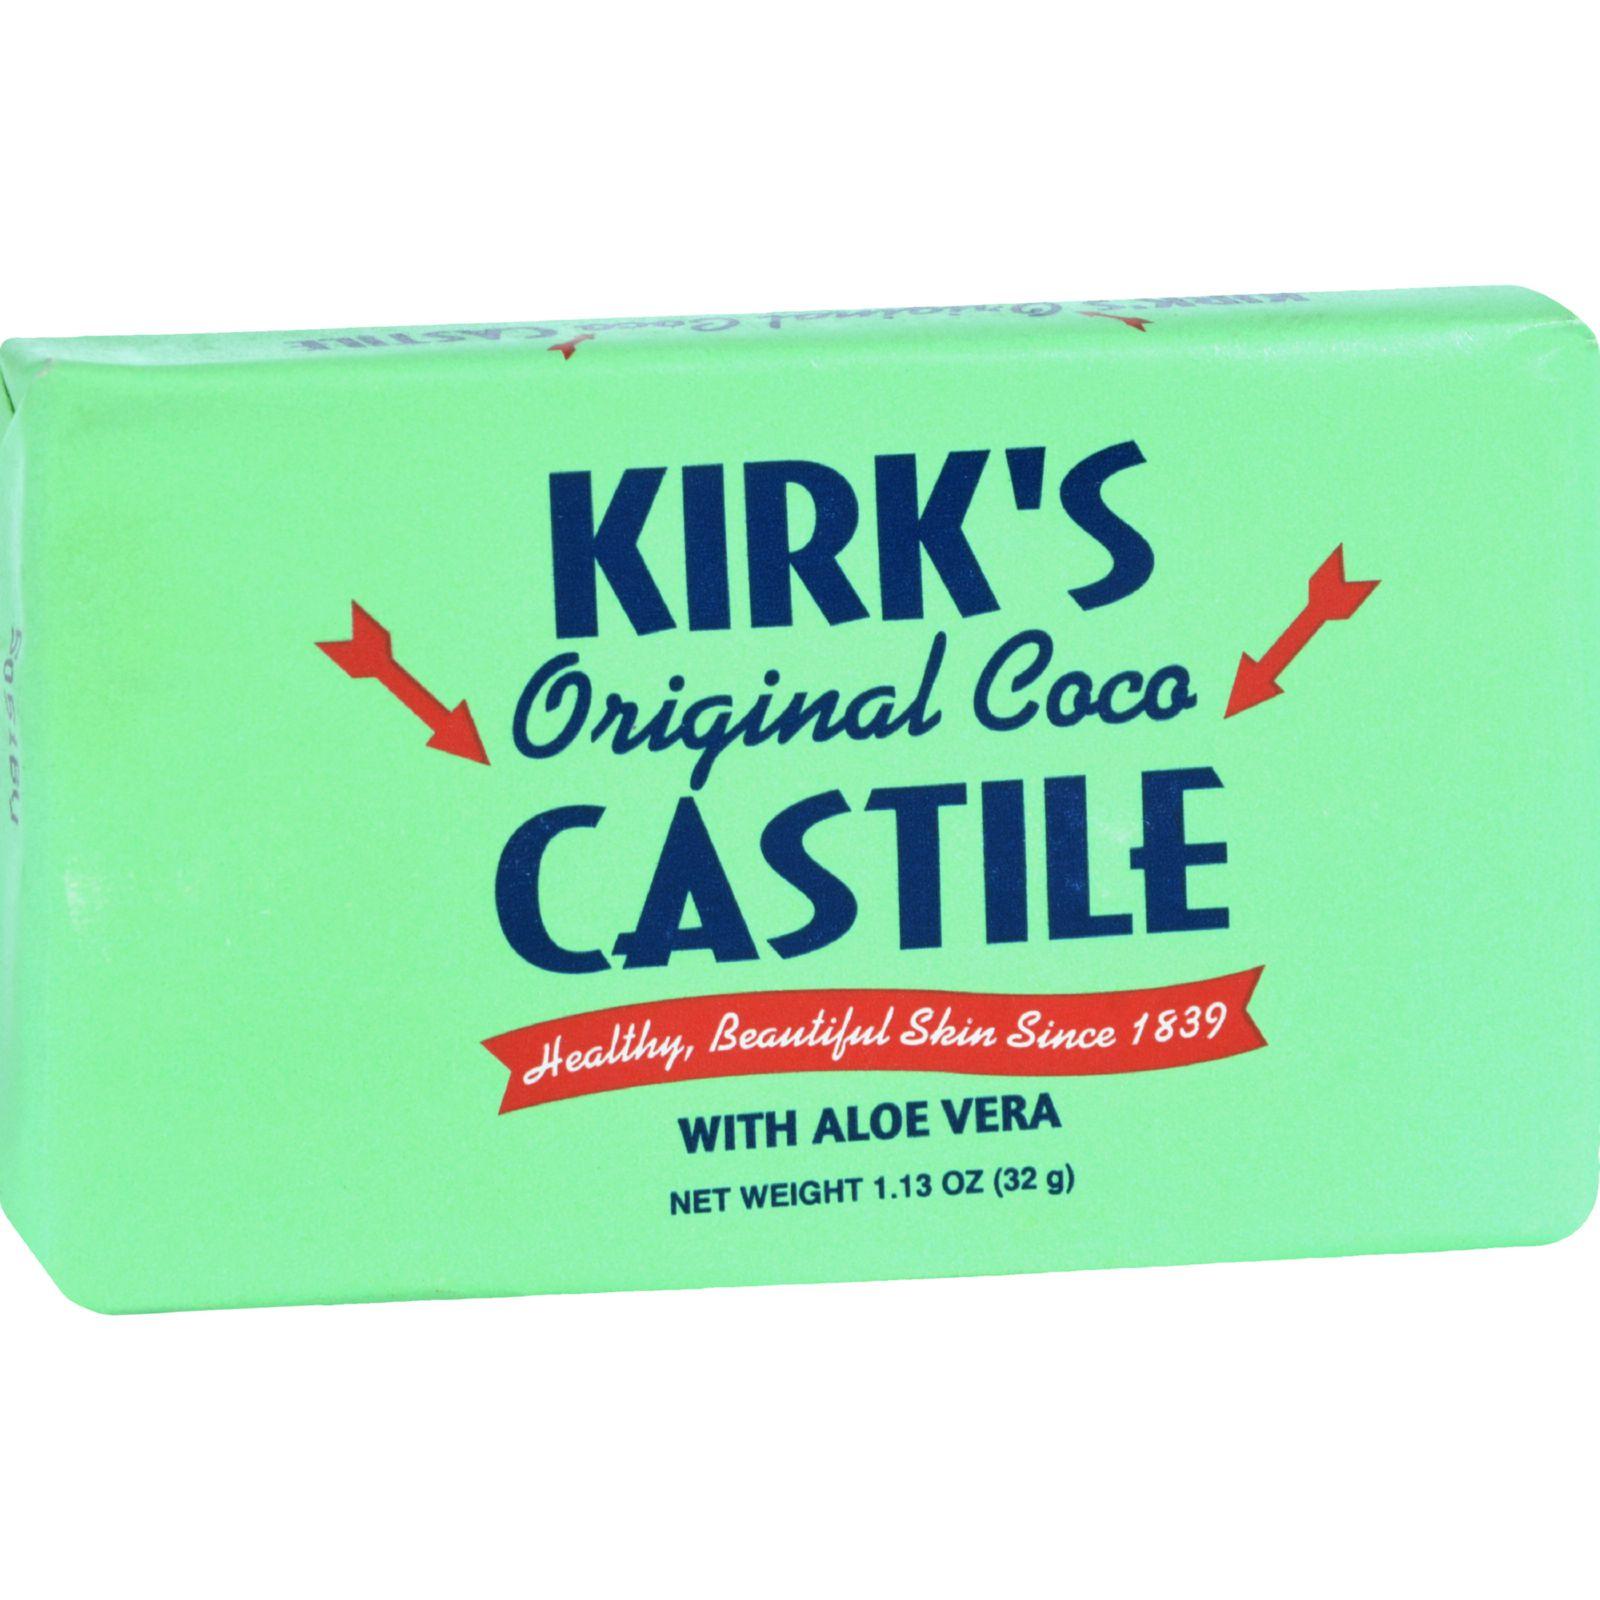 Kirks Natural Bar Soap  Coco Castile  Aloe Vera  Travel Size  1.13 oz